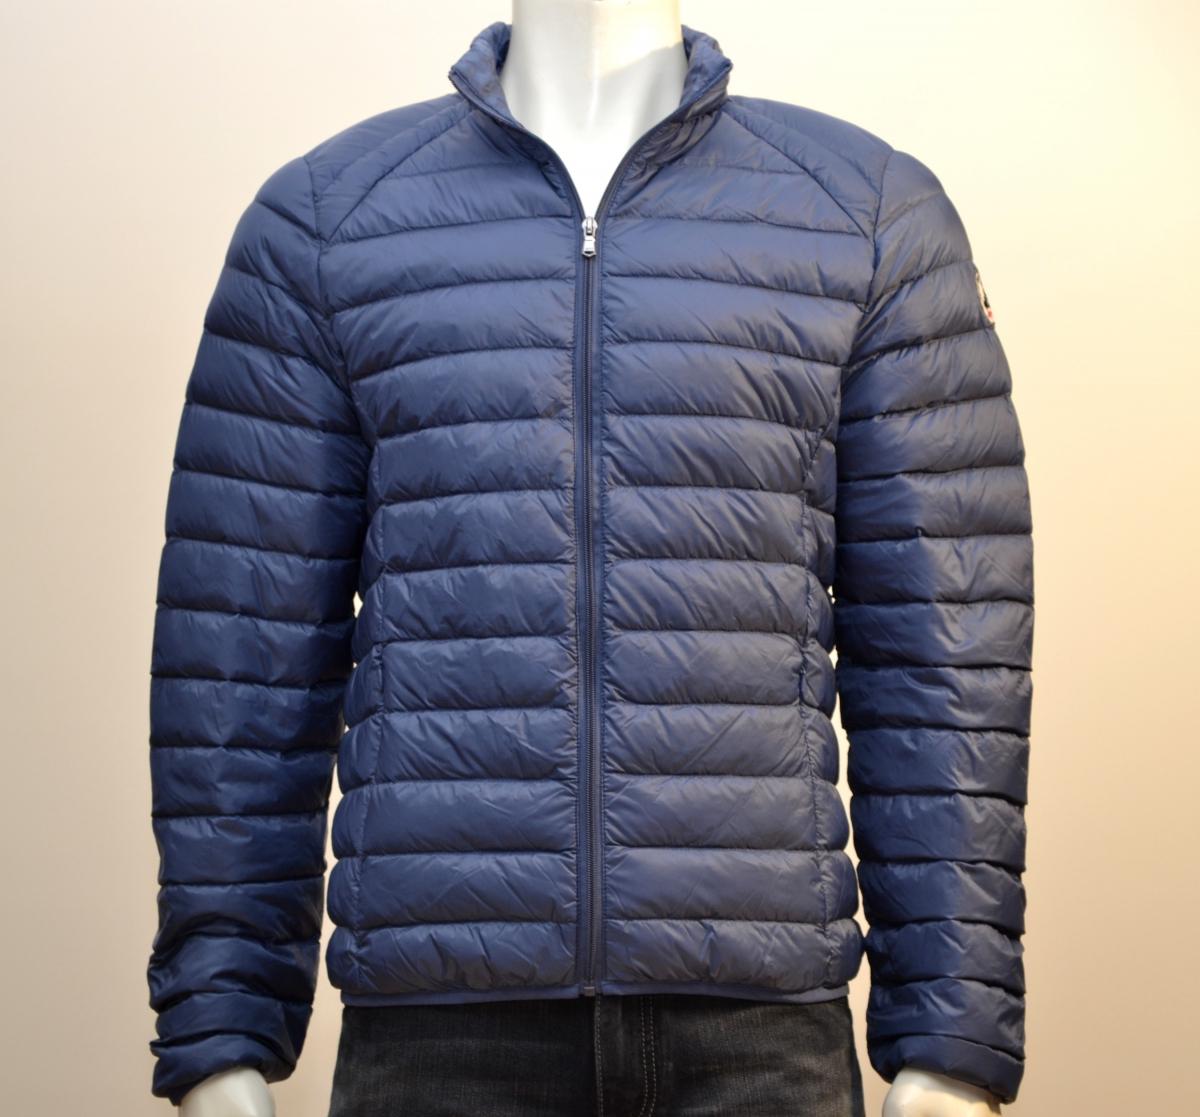 magasin d'usine 0ee19 d7aeb Doudoune JOTT MAT Indigo JOTT - Vêtements de marque ...